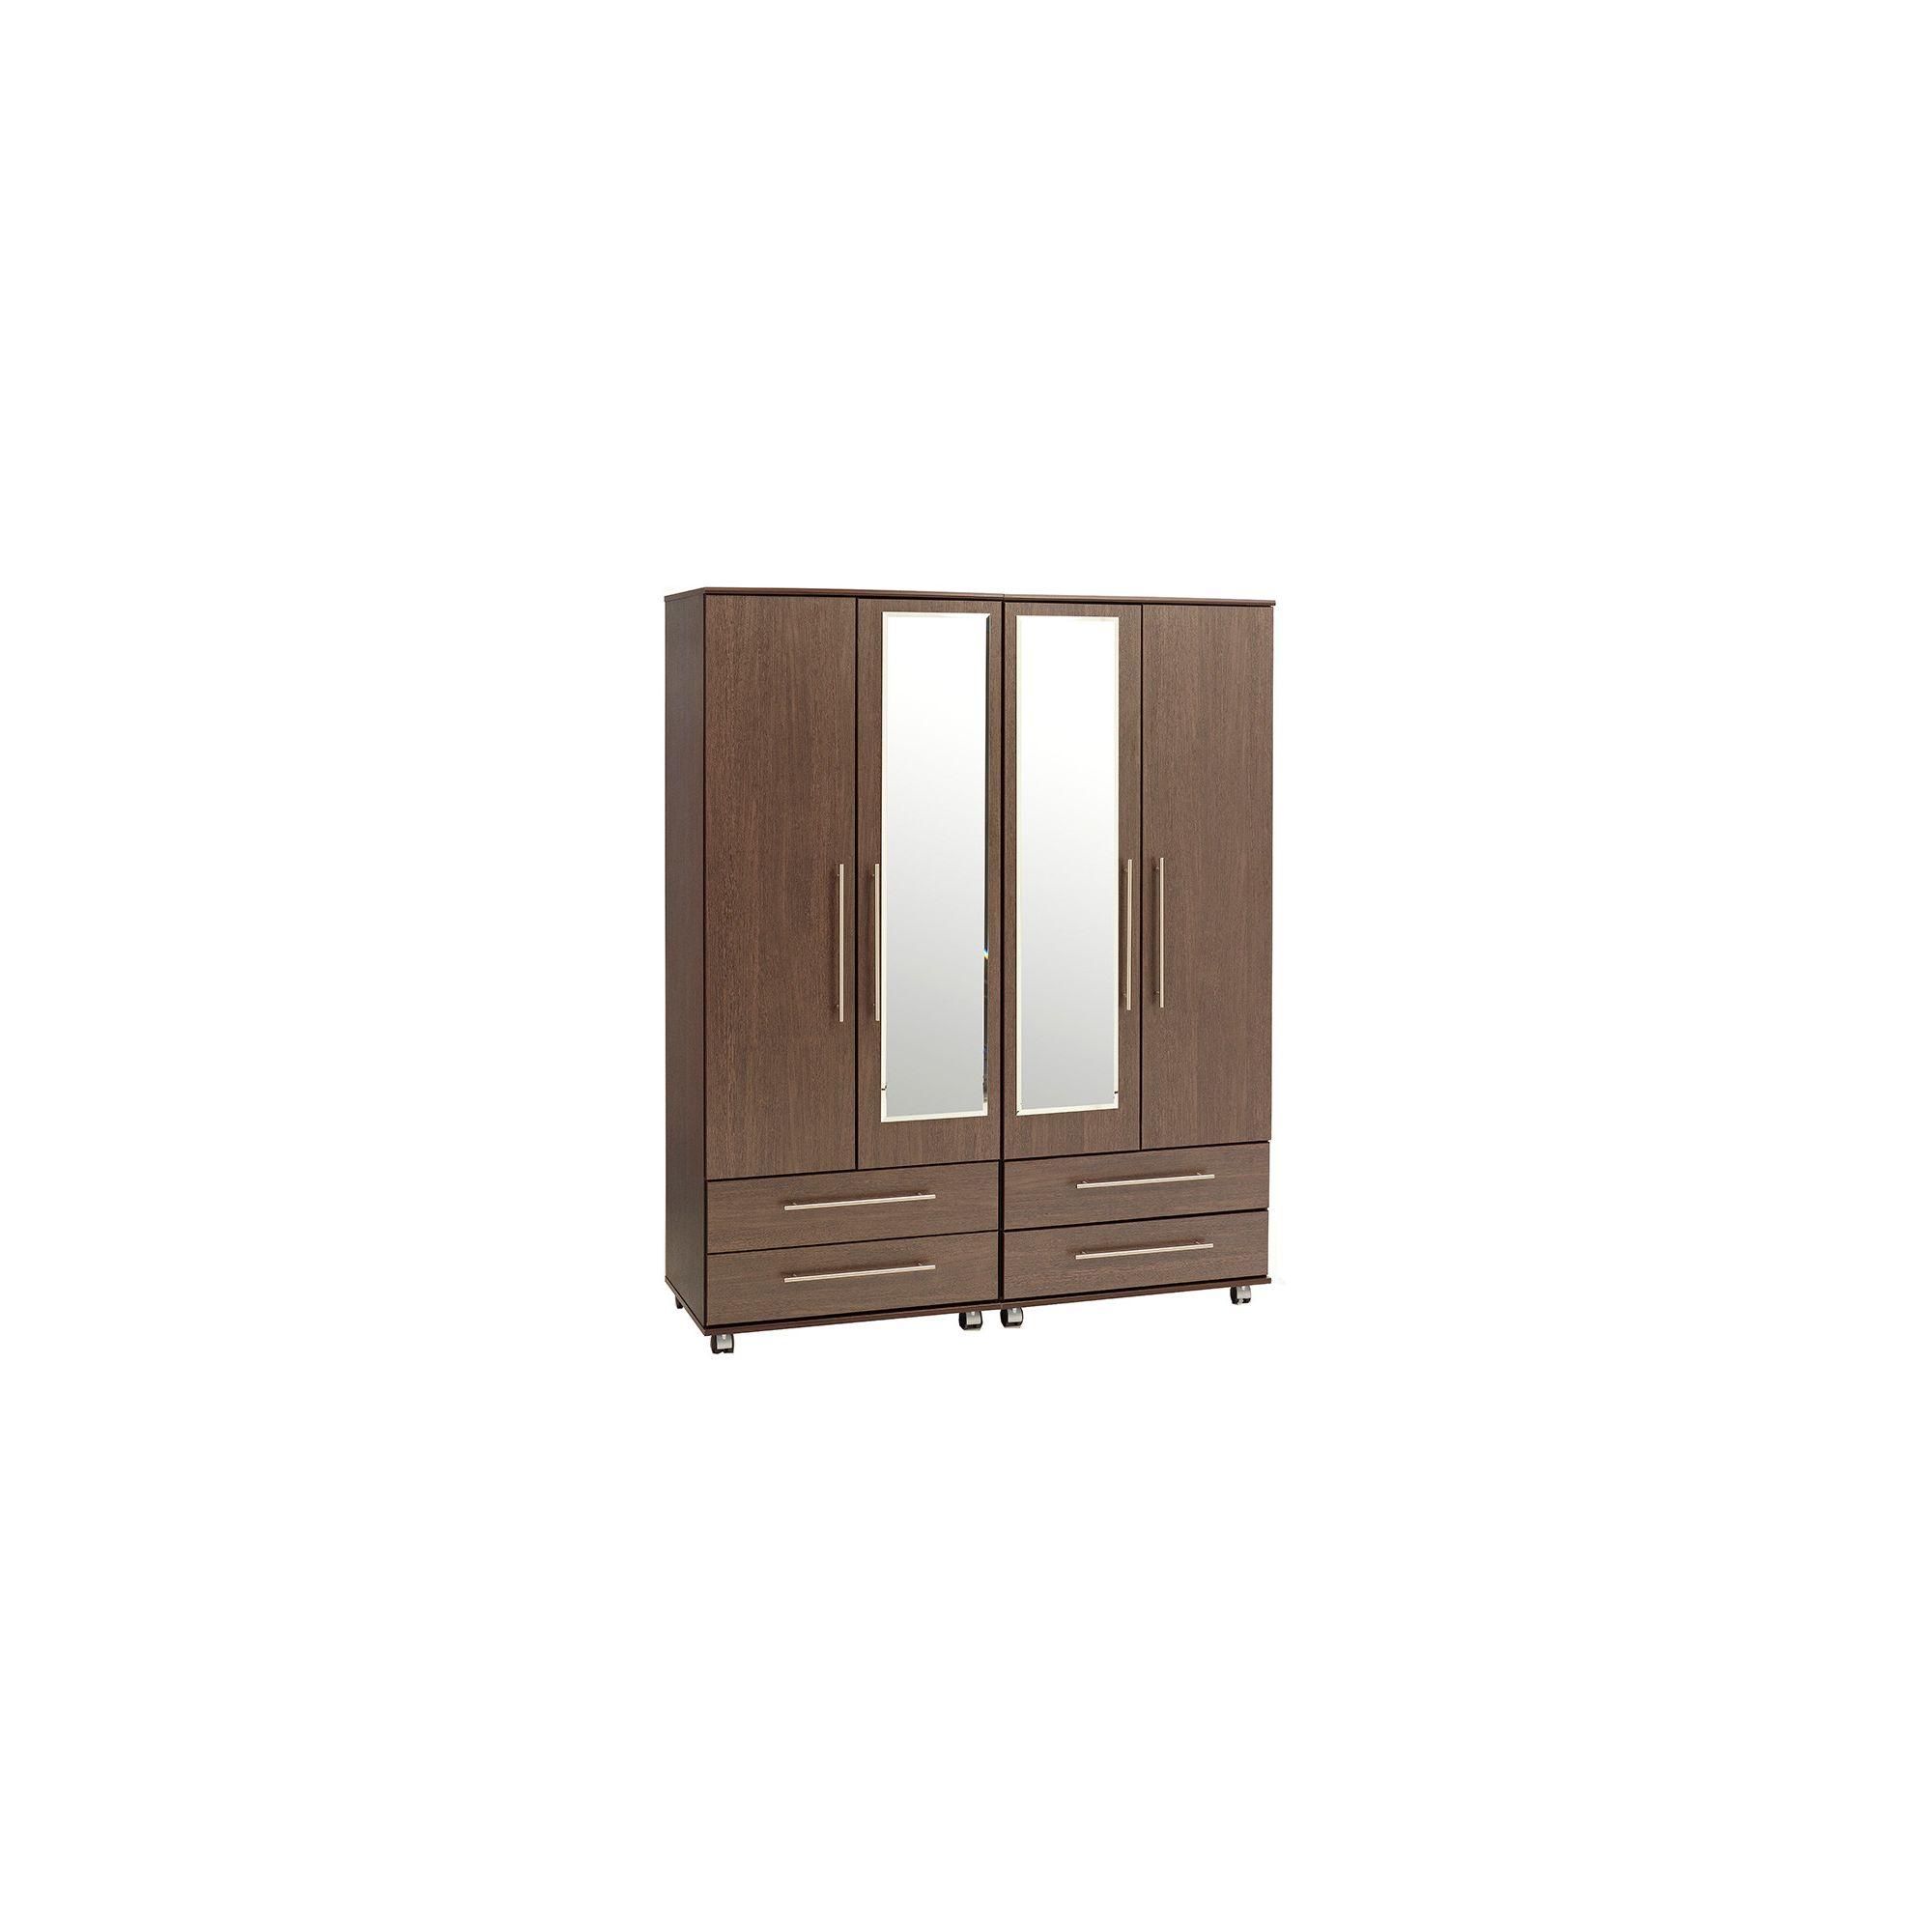 Ideal Furniture New York 4 Door Wardrobe - Beech at Tesco Direct